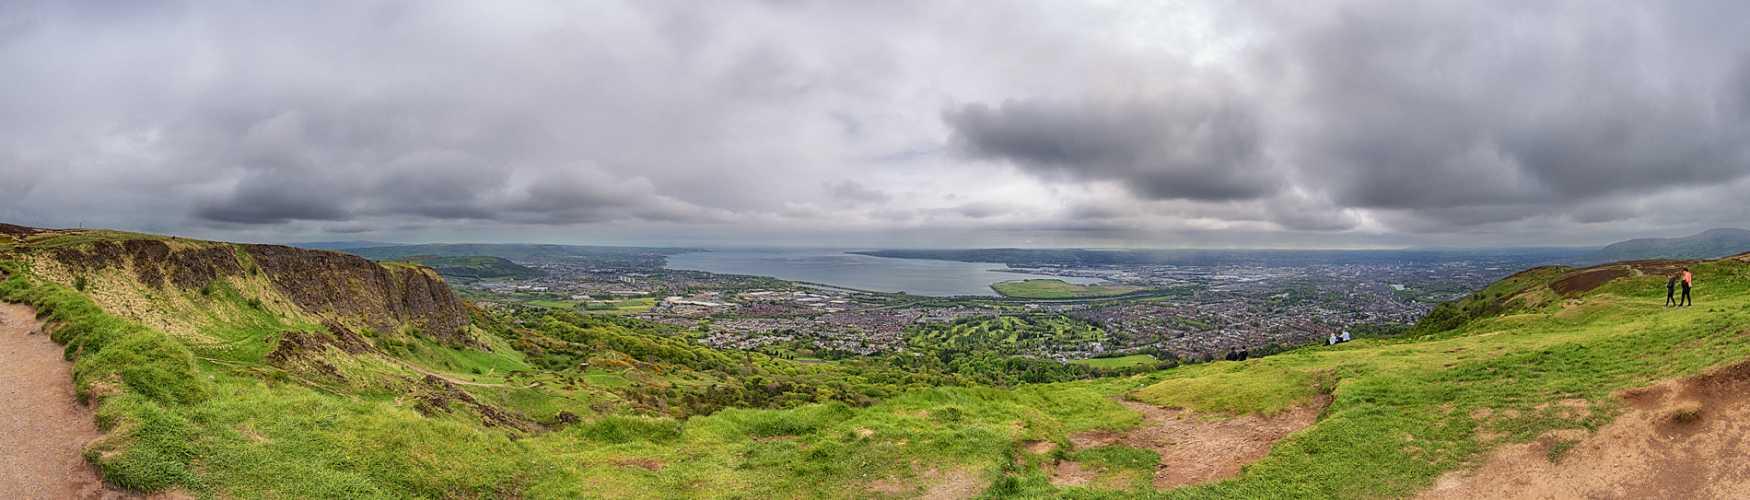 Cavehill - Noord Ierland